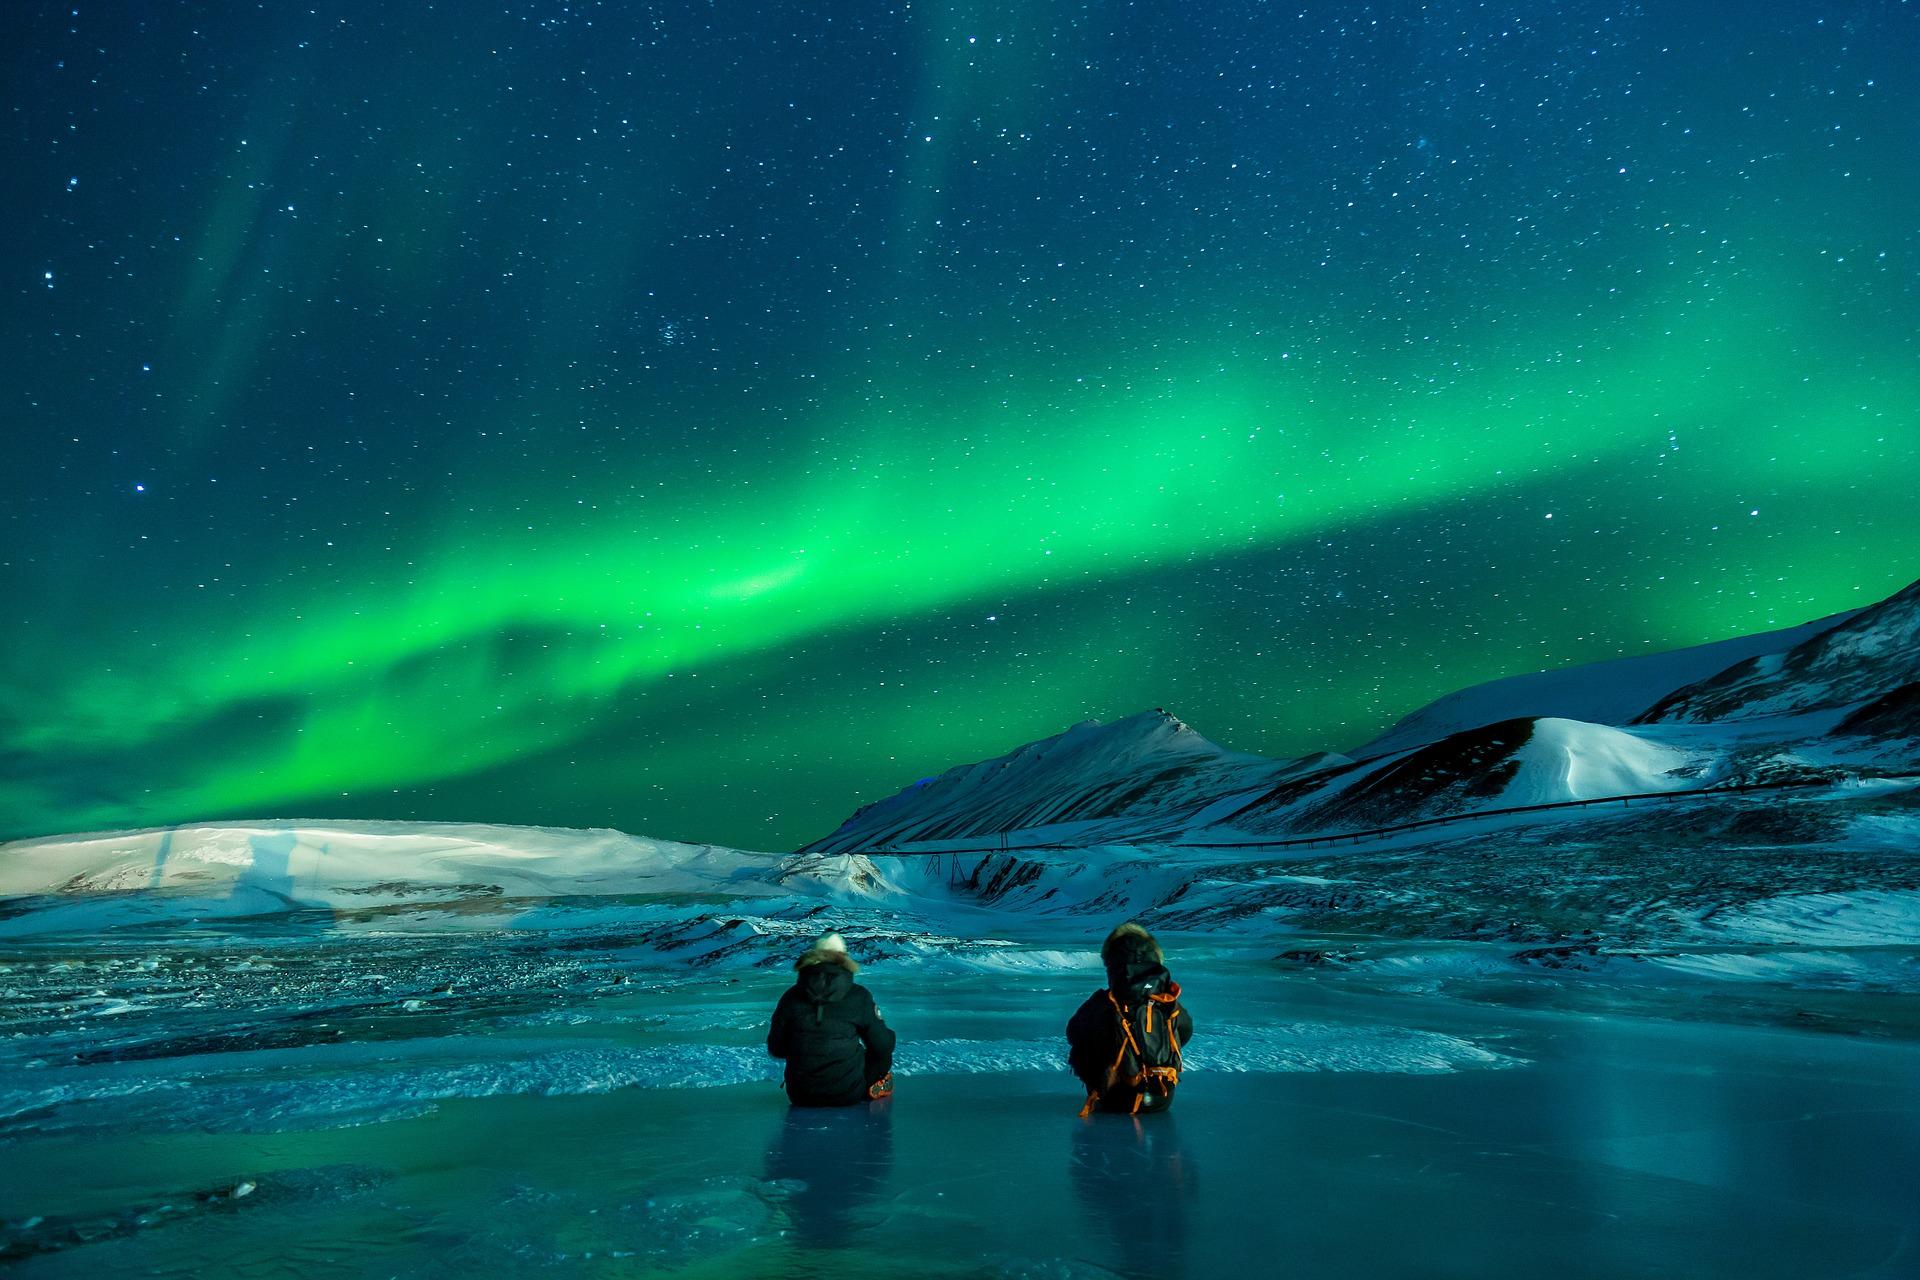 Aurora - Polarna svetlost